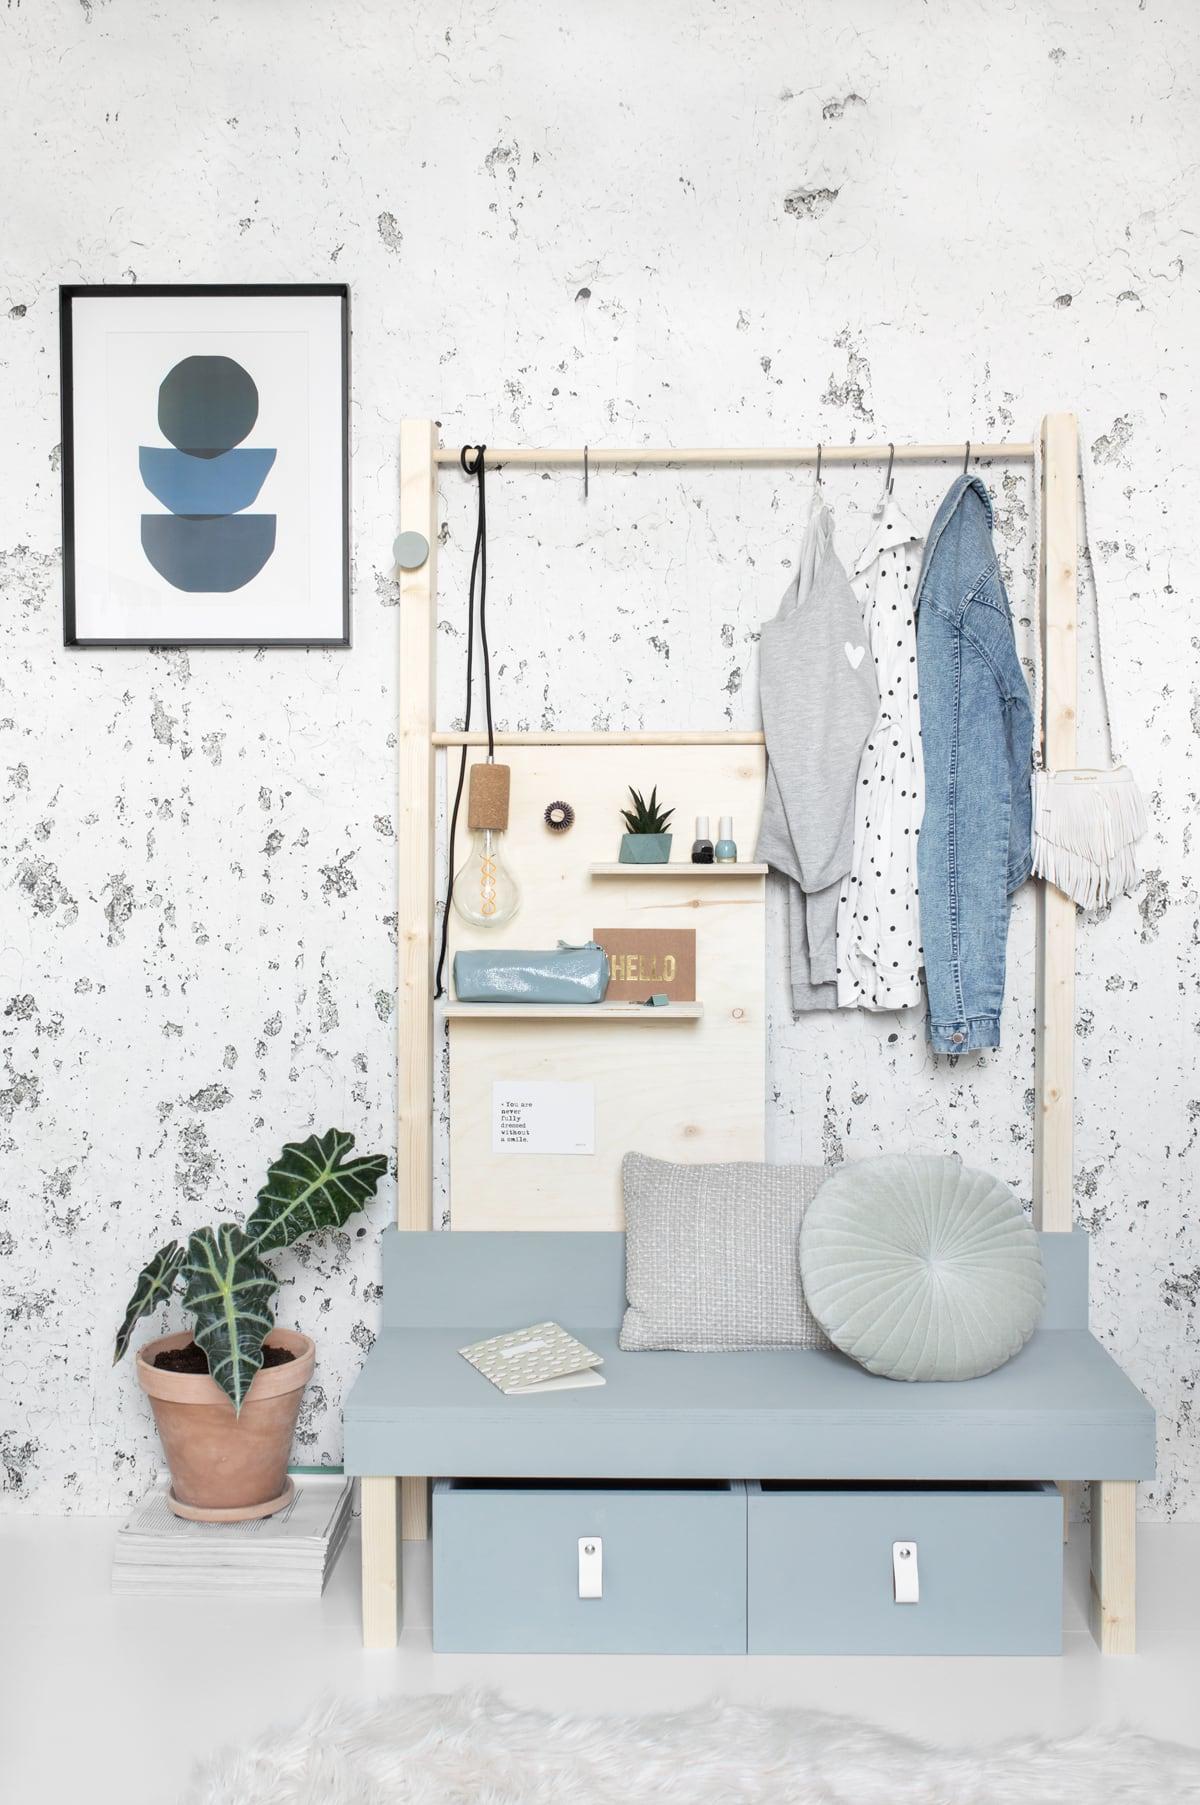 Tienerkamer DIY bankje met opbergruimte - Tanja van Hoogdalem